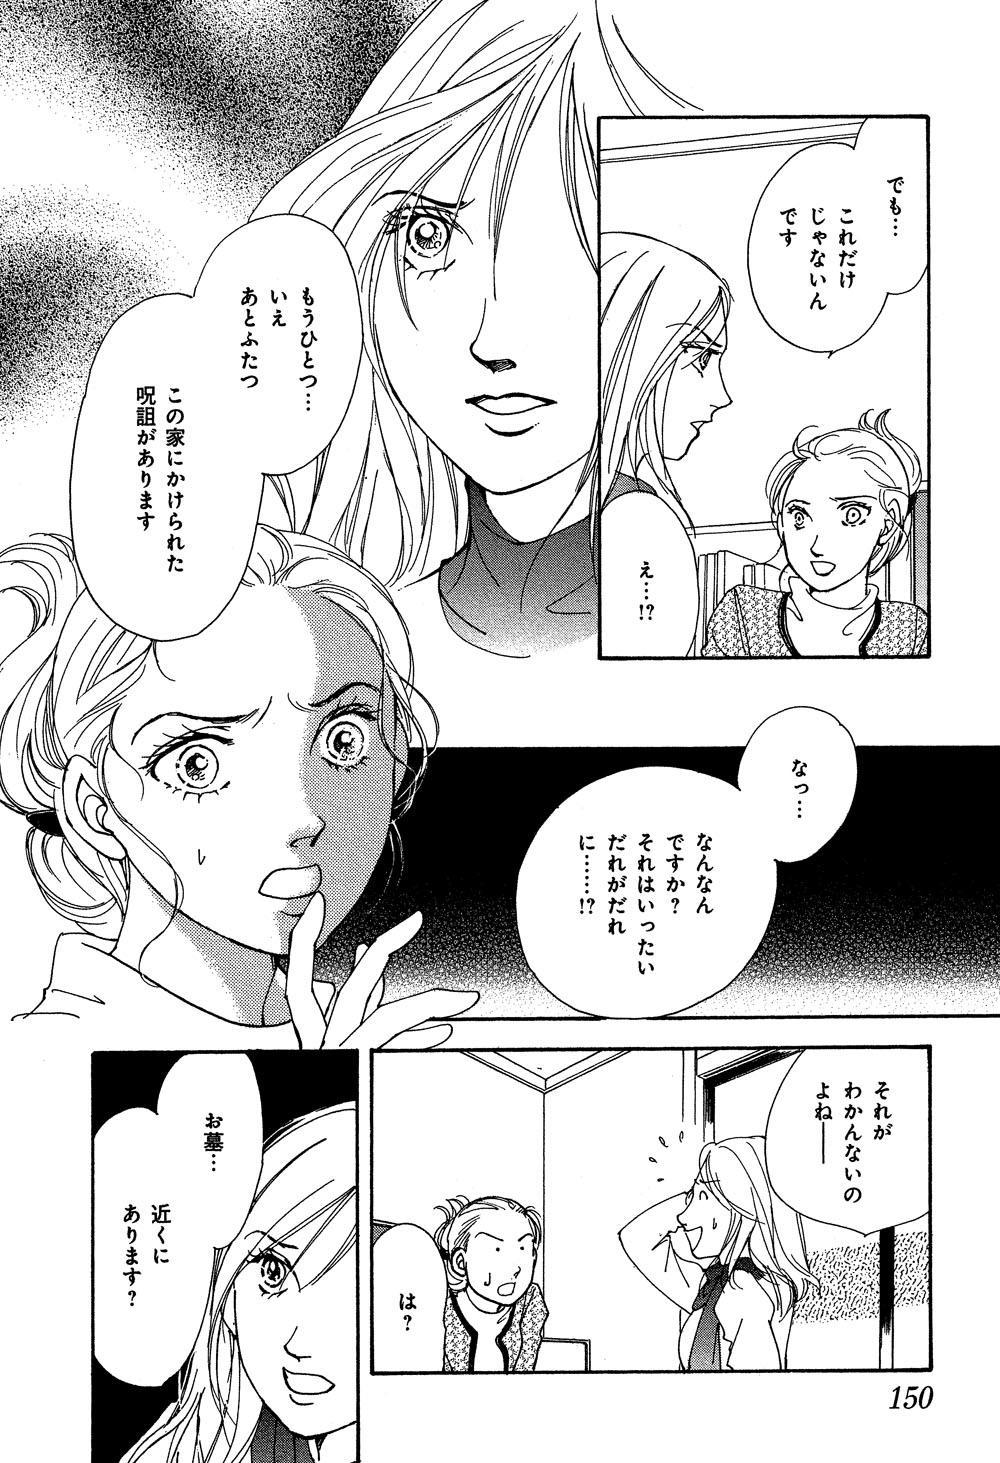 mayuri_0001_0150.jpg